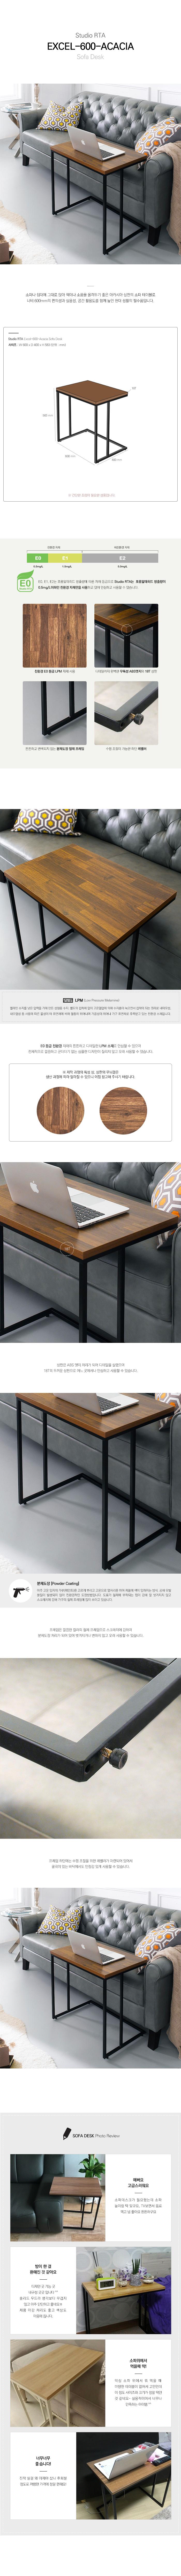 Aspen-600-Acacia-Sofa-Desk.jpg